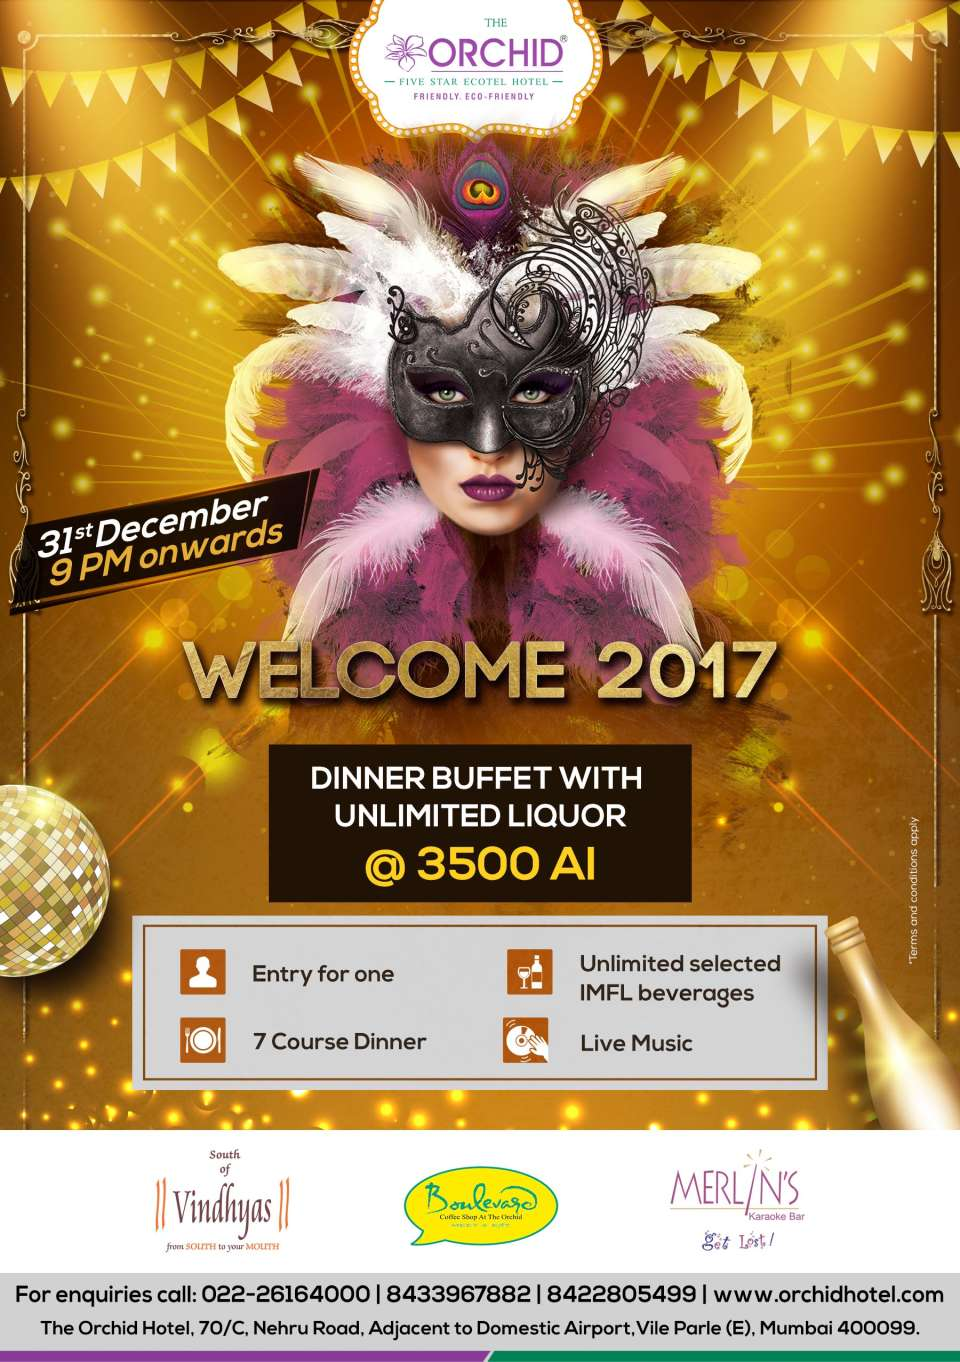 The Orchid - Five Star Ecotel Hotel Mumbai The Orchid Hotel Mumbai New year 2017